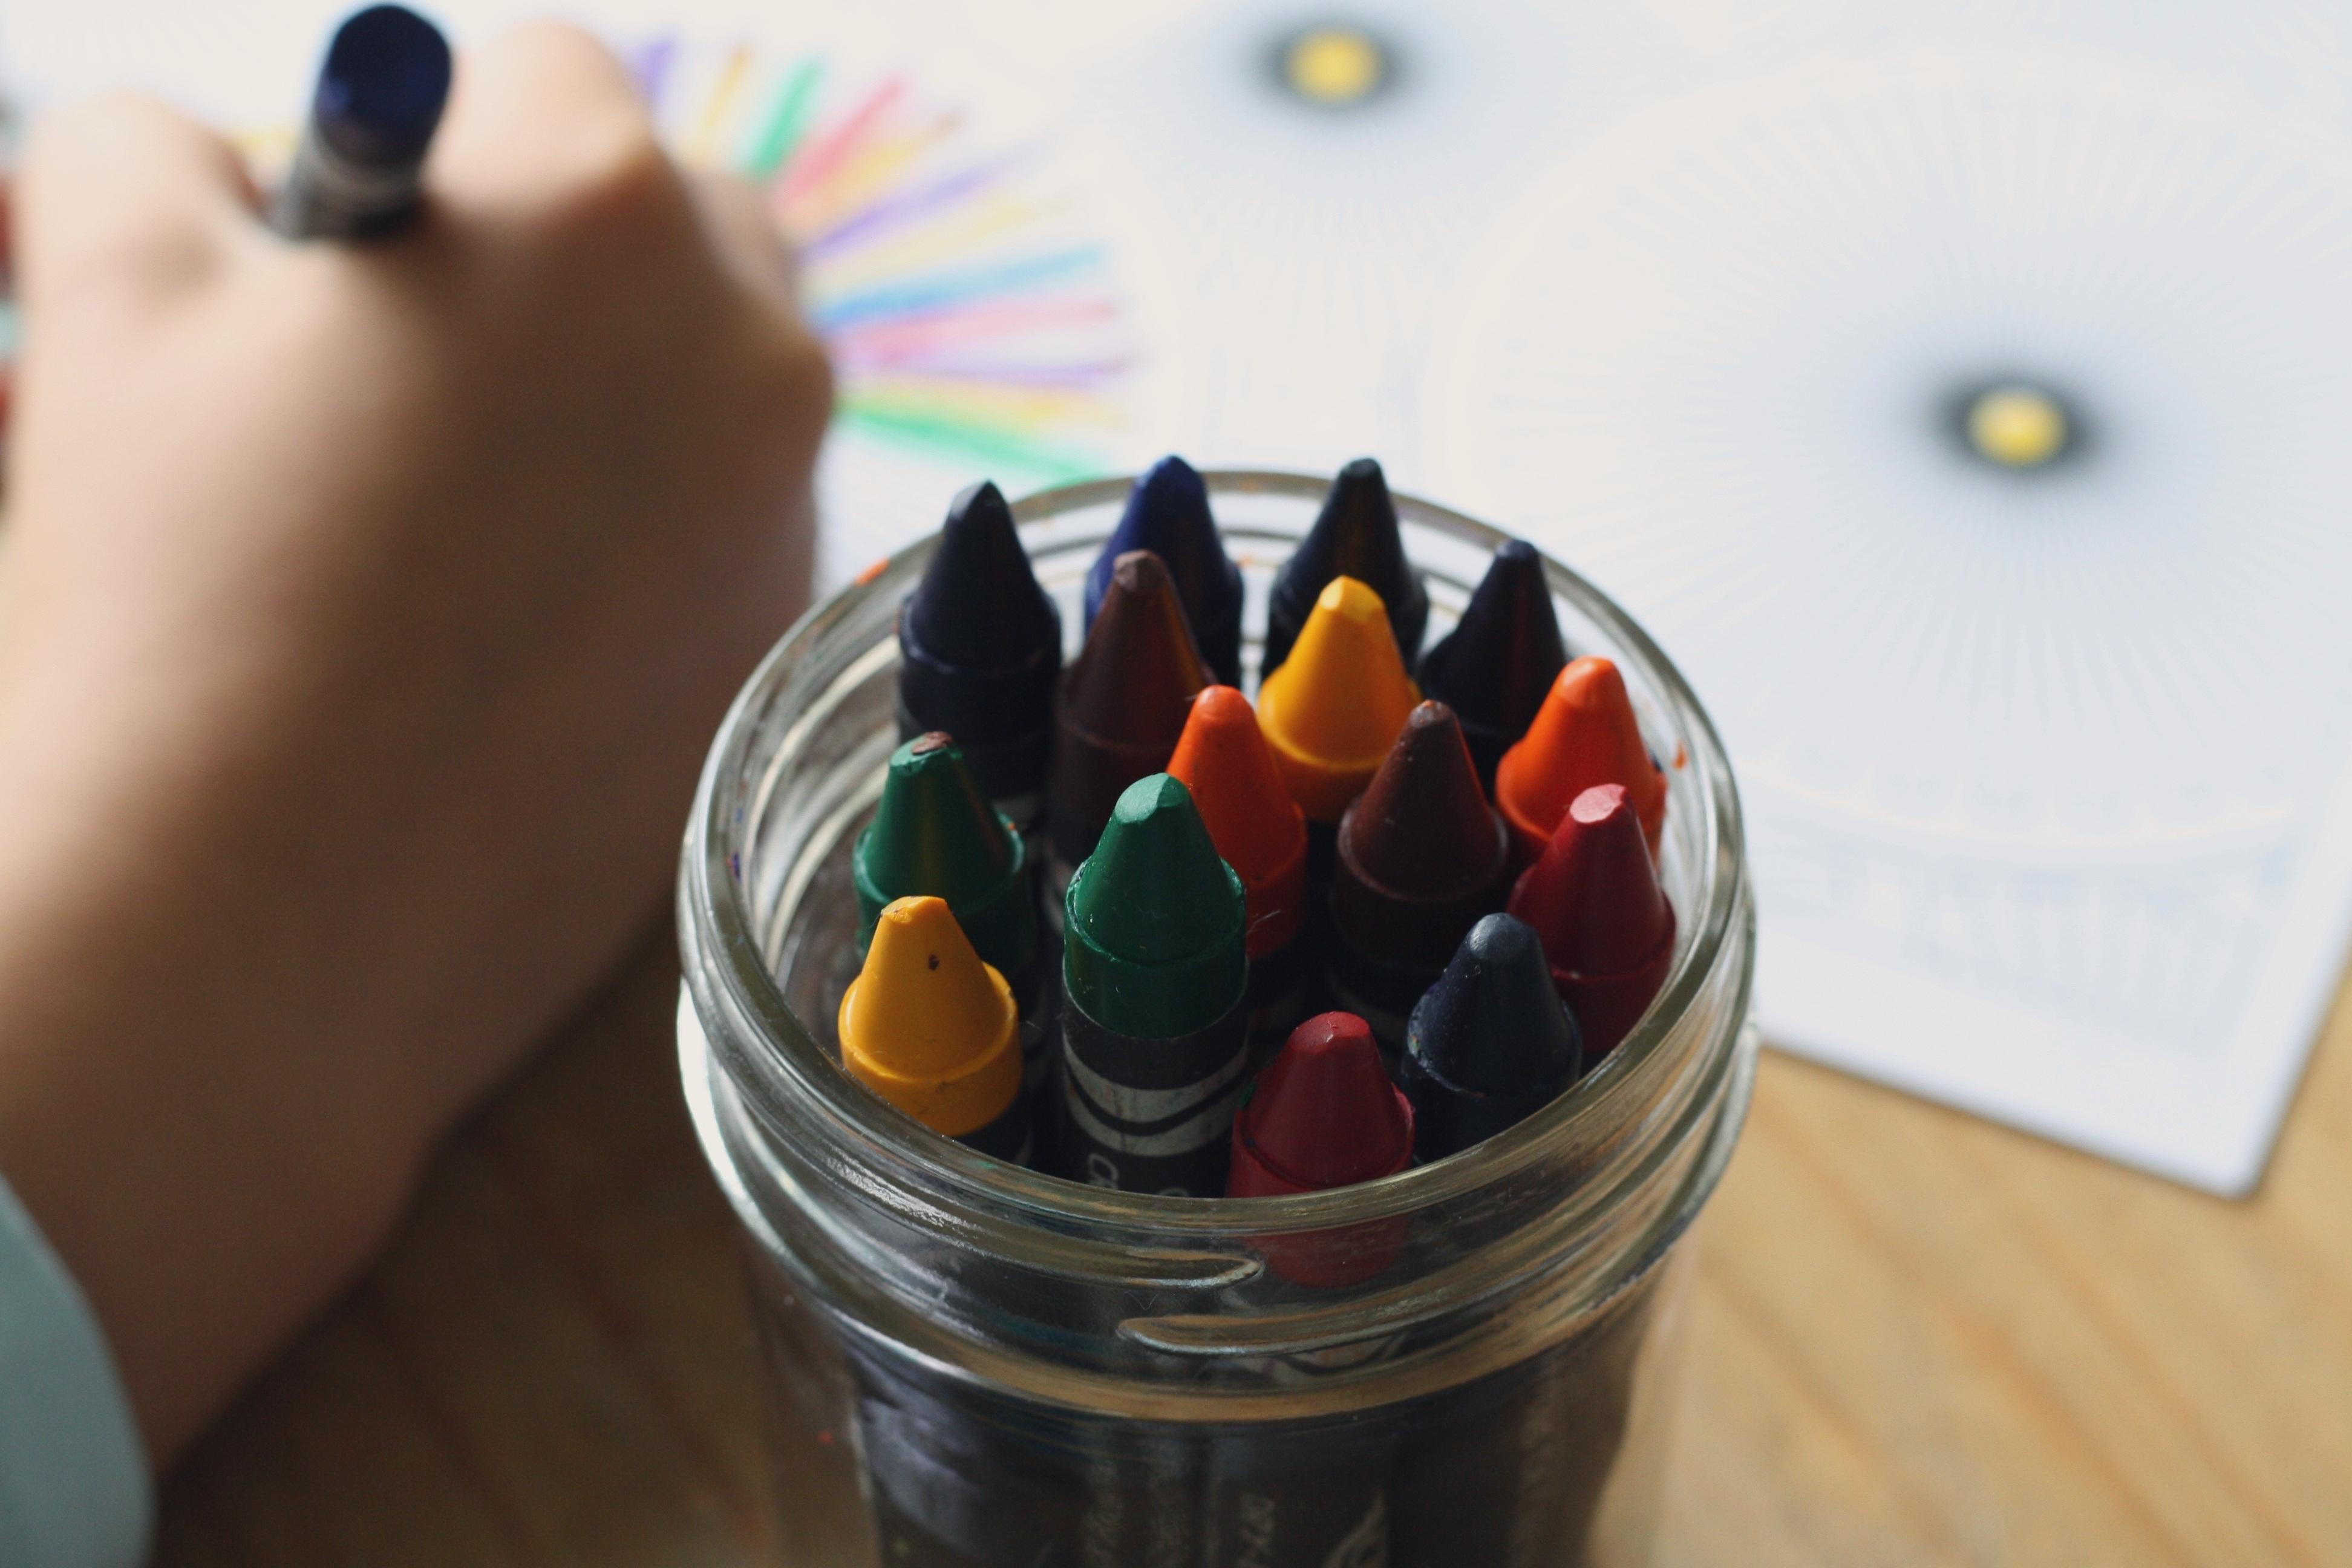 Fotos gratis : mano, creativo, niño, dedo, azul, jugando, vistoso ...